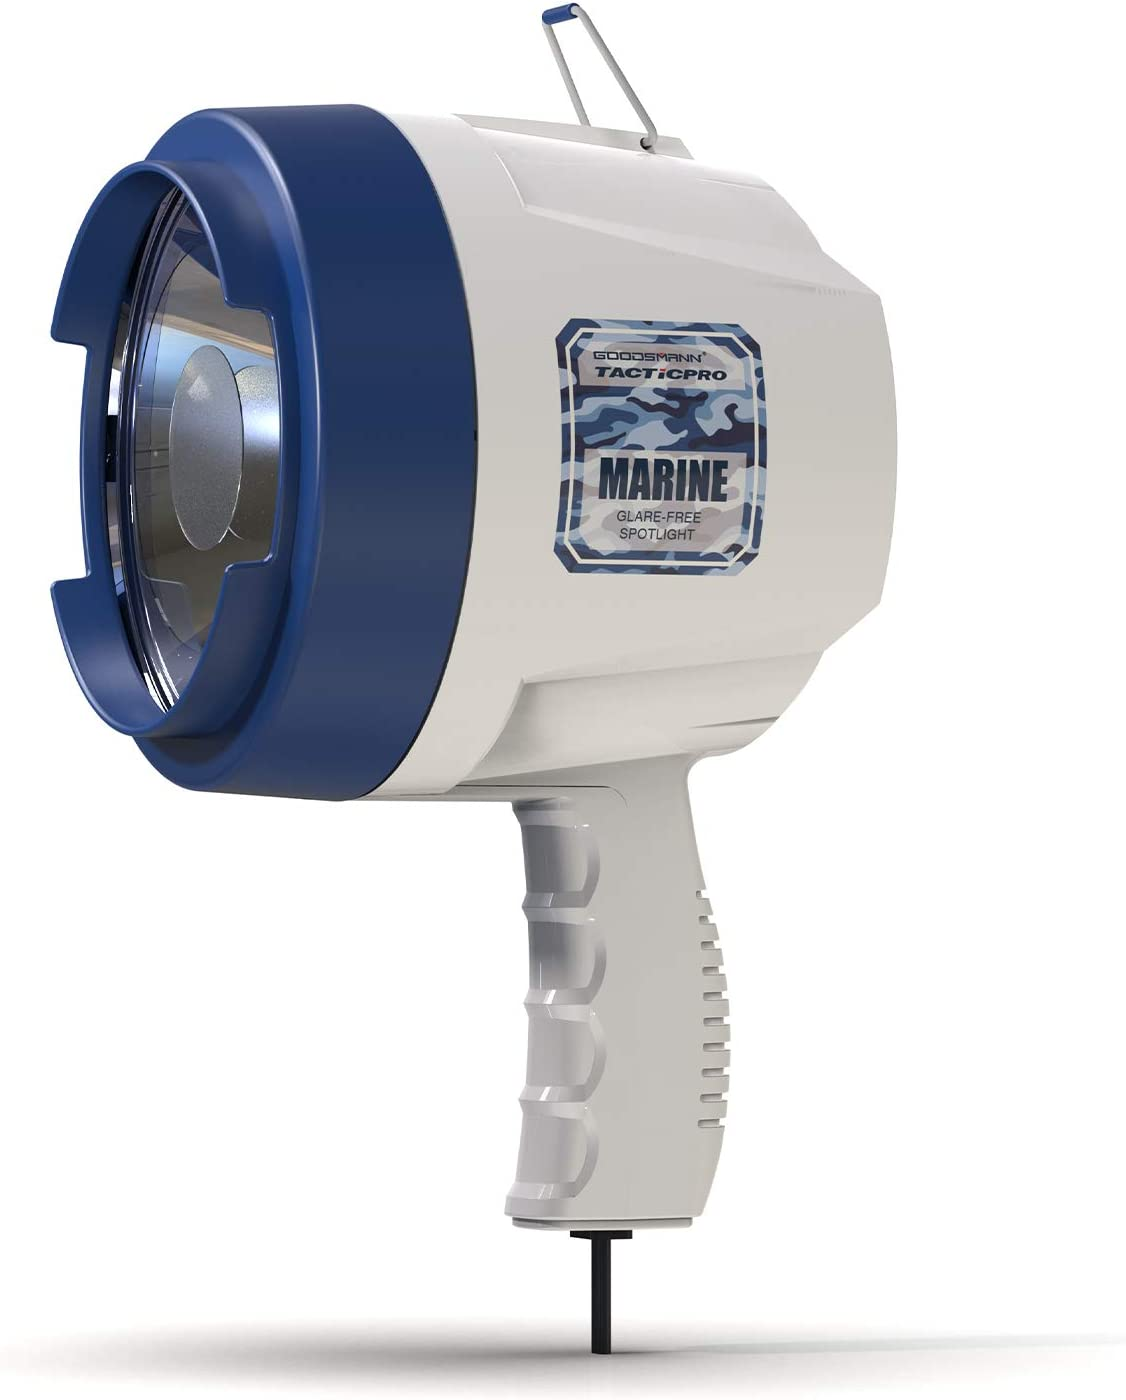 West Marine Waterproof LED Flashlight 60 Lumens Battery Included New /& Free SH